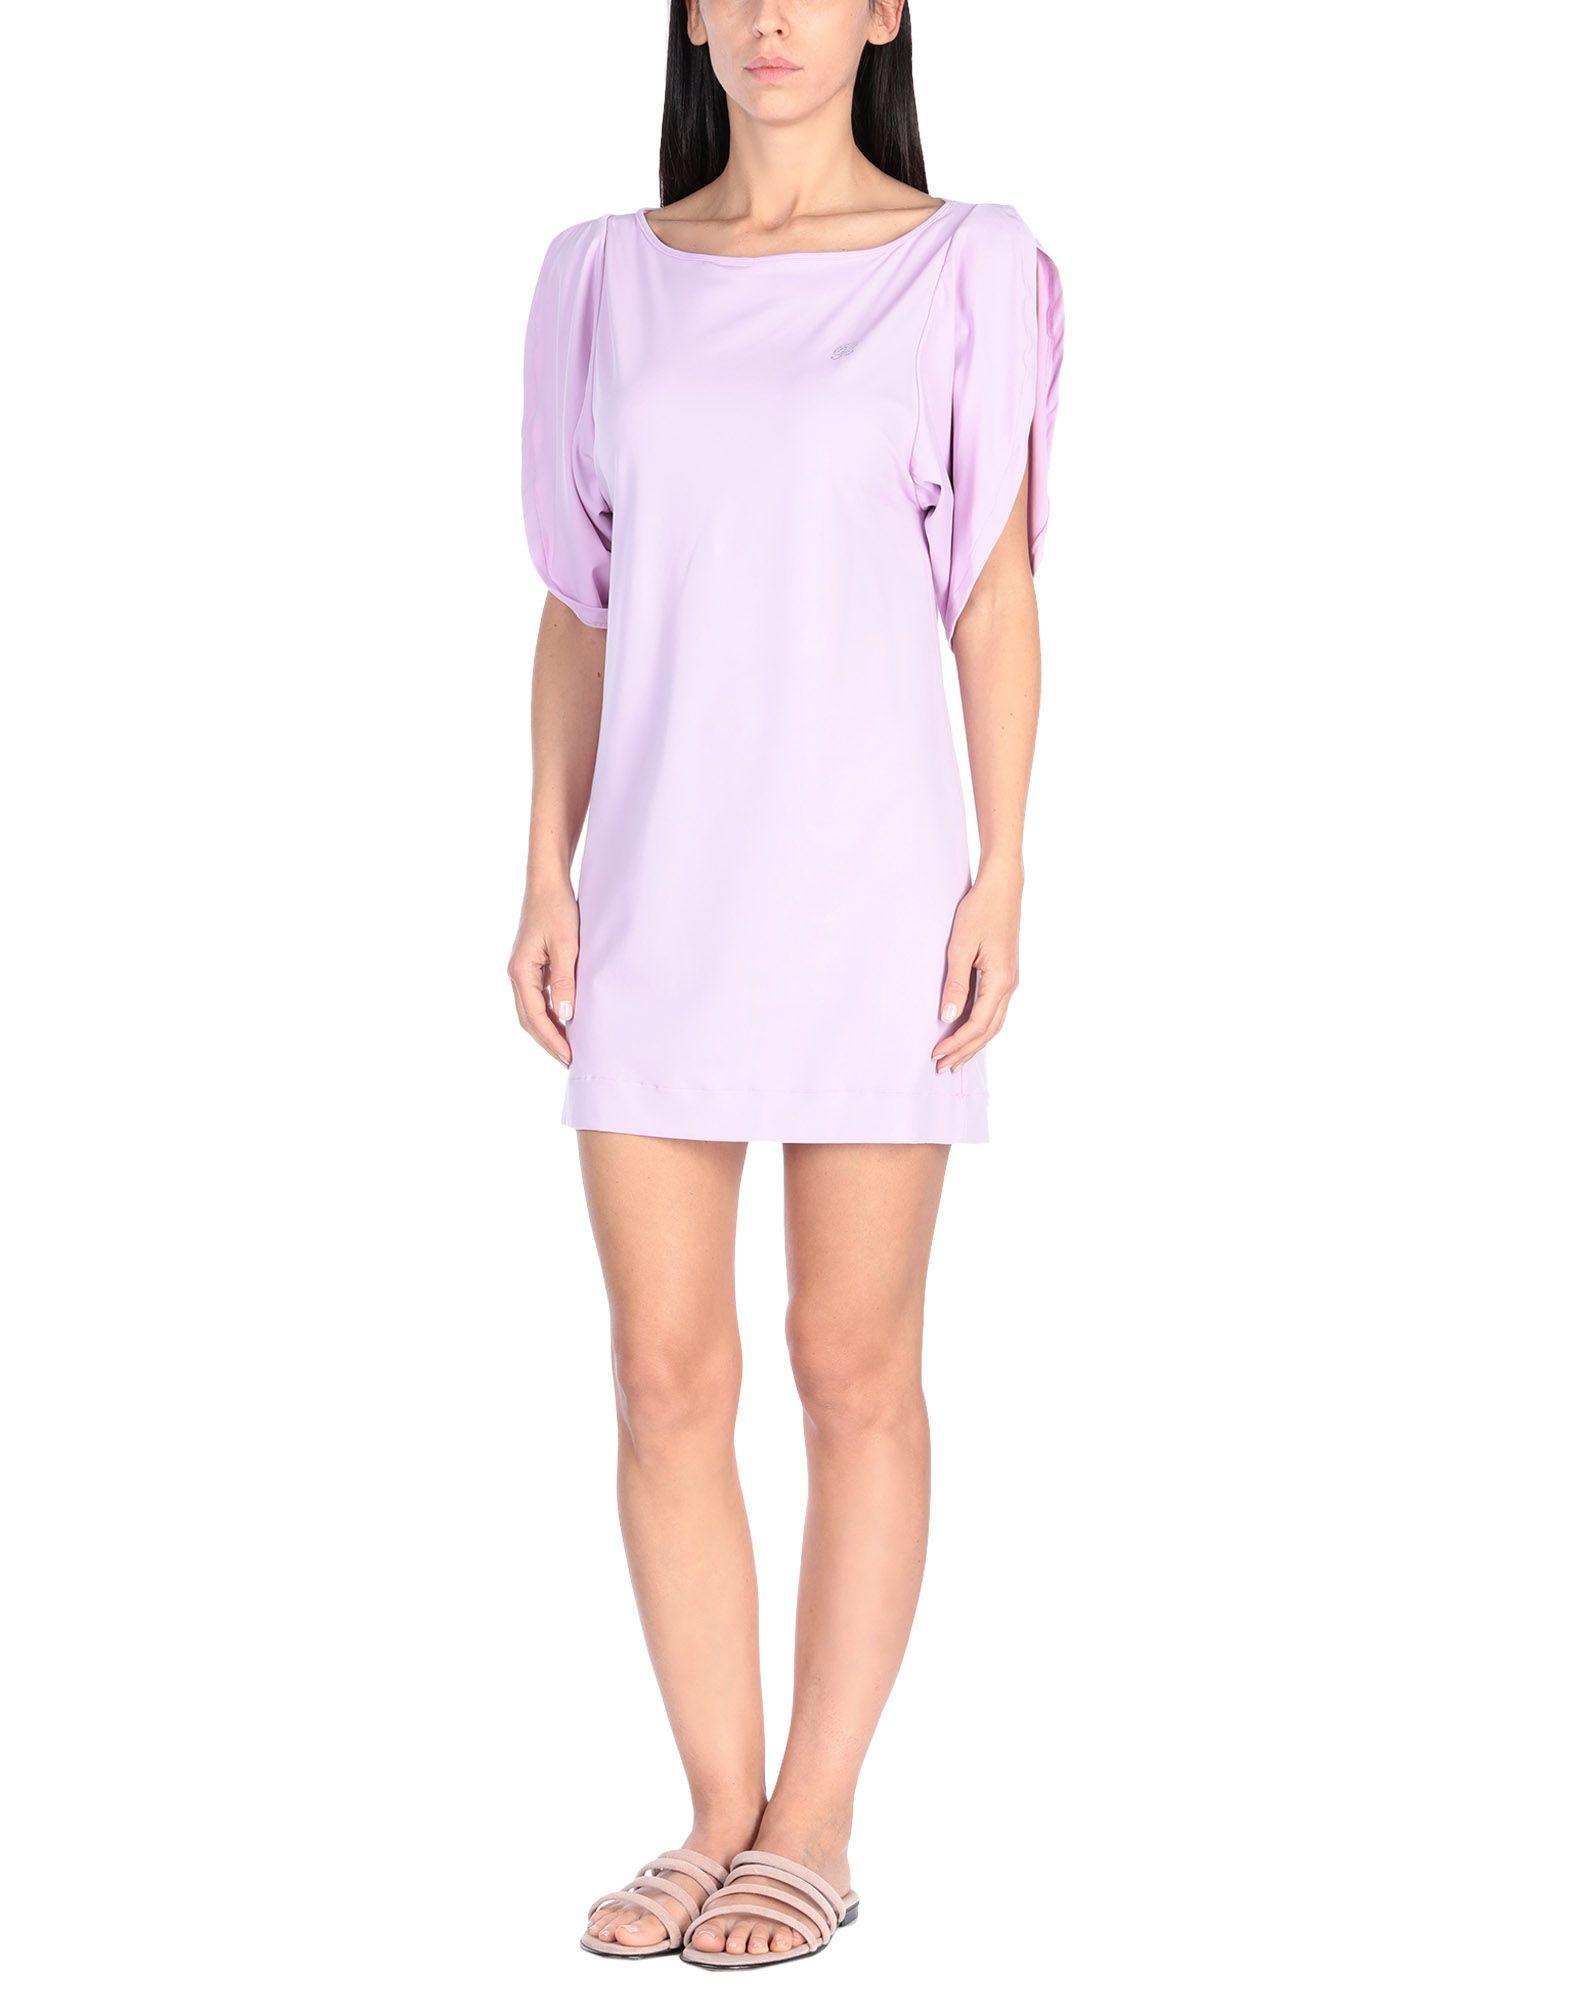 BLUMARINE BEACHWEAR Пляжное платье blugirl blumarine beachwear слитный купальник